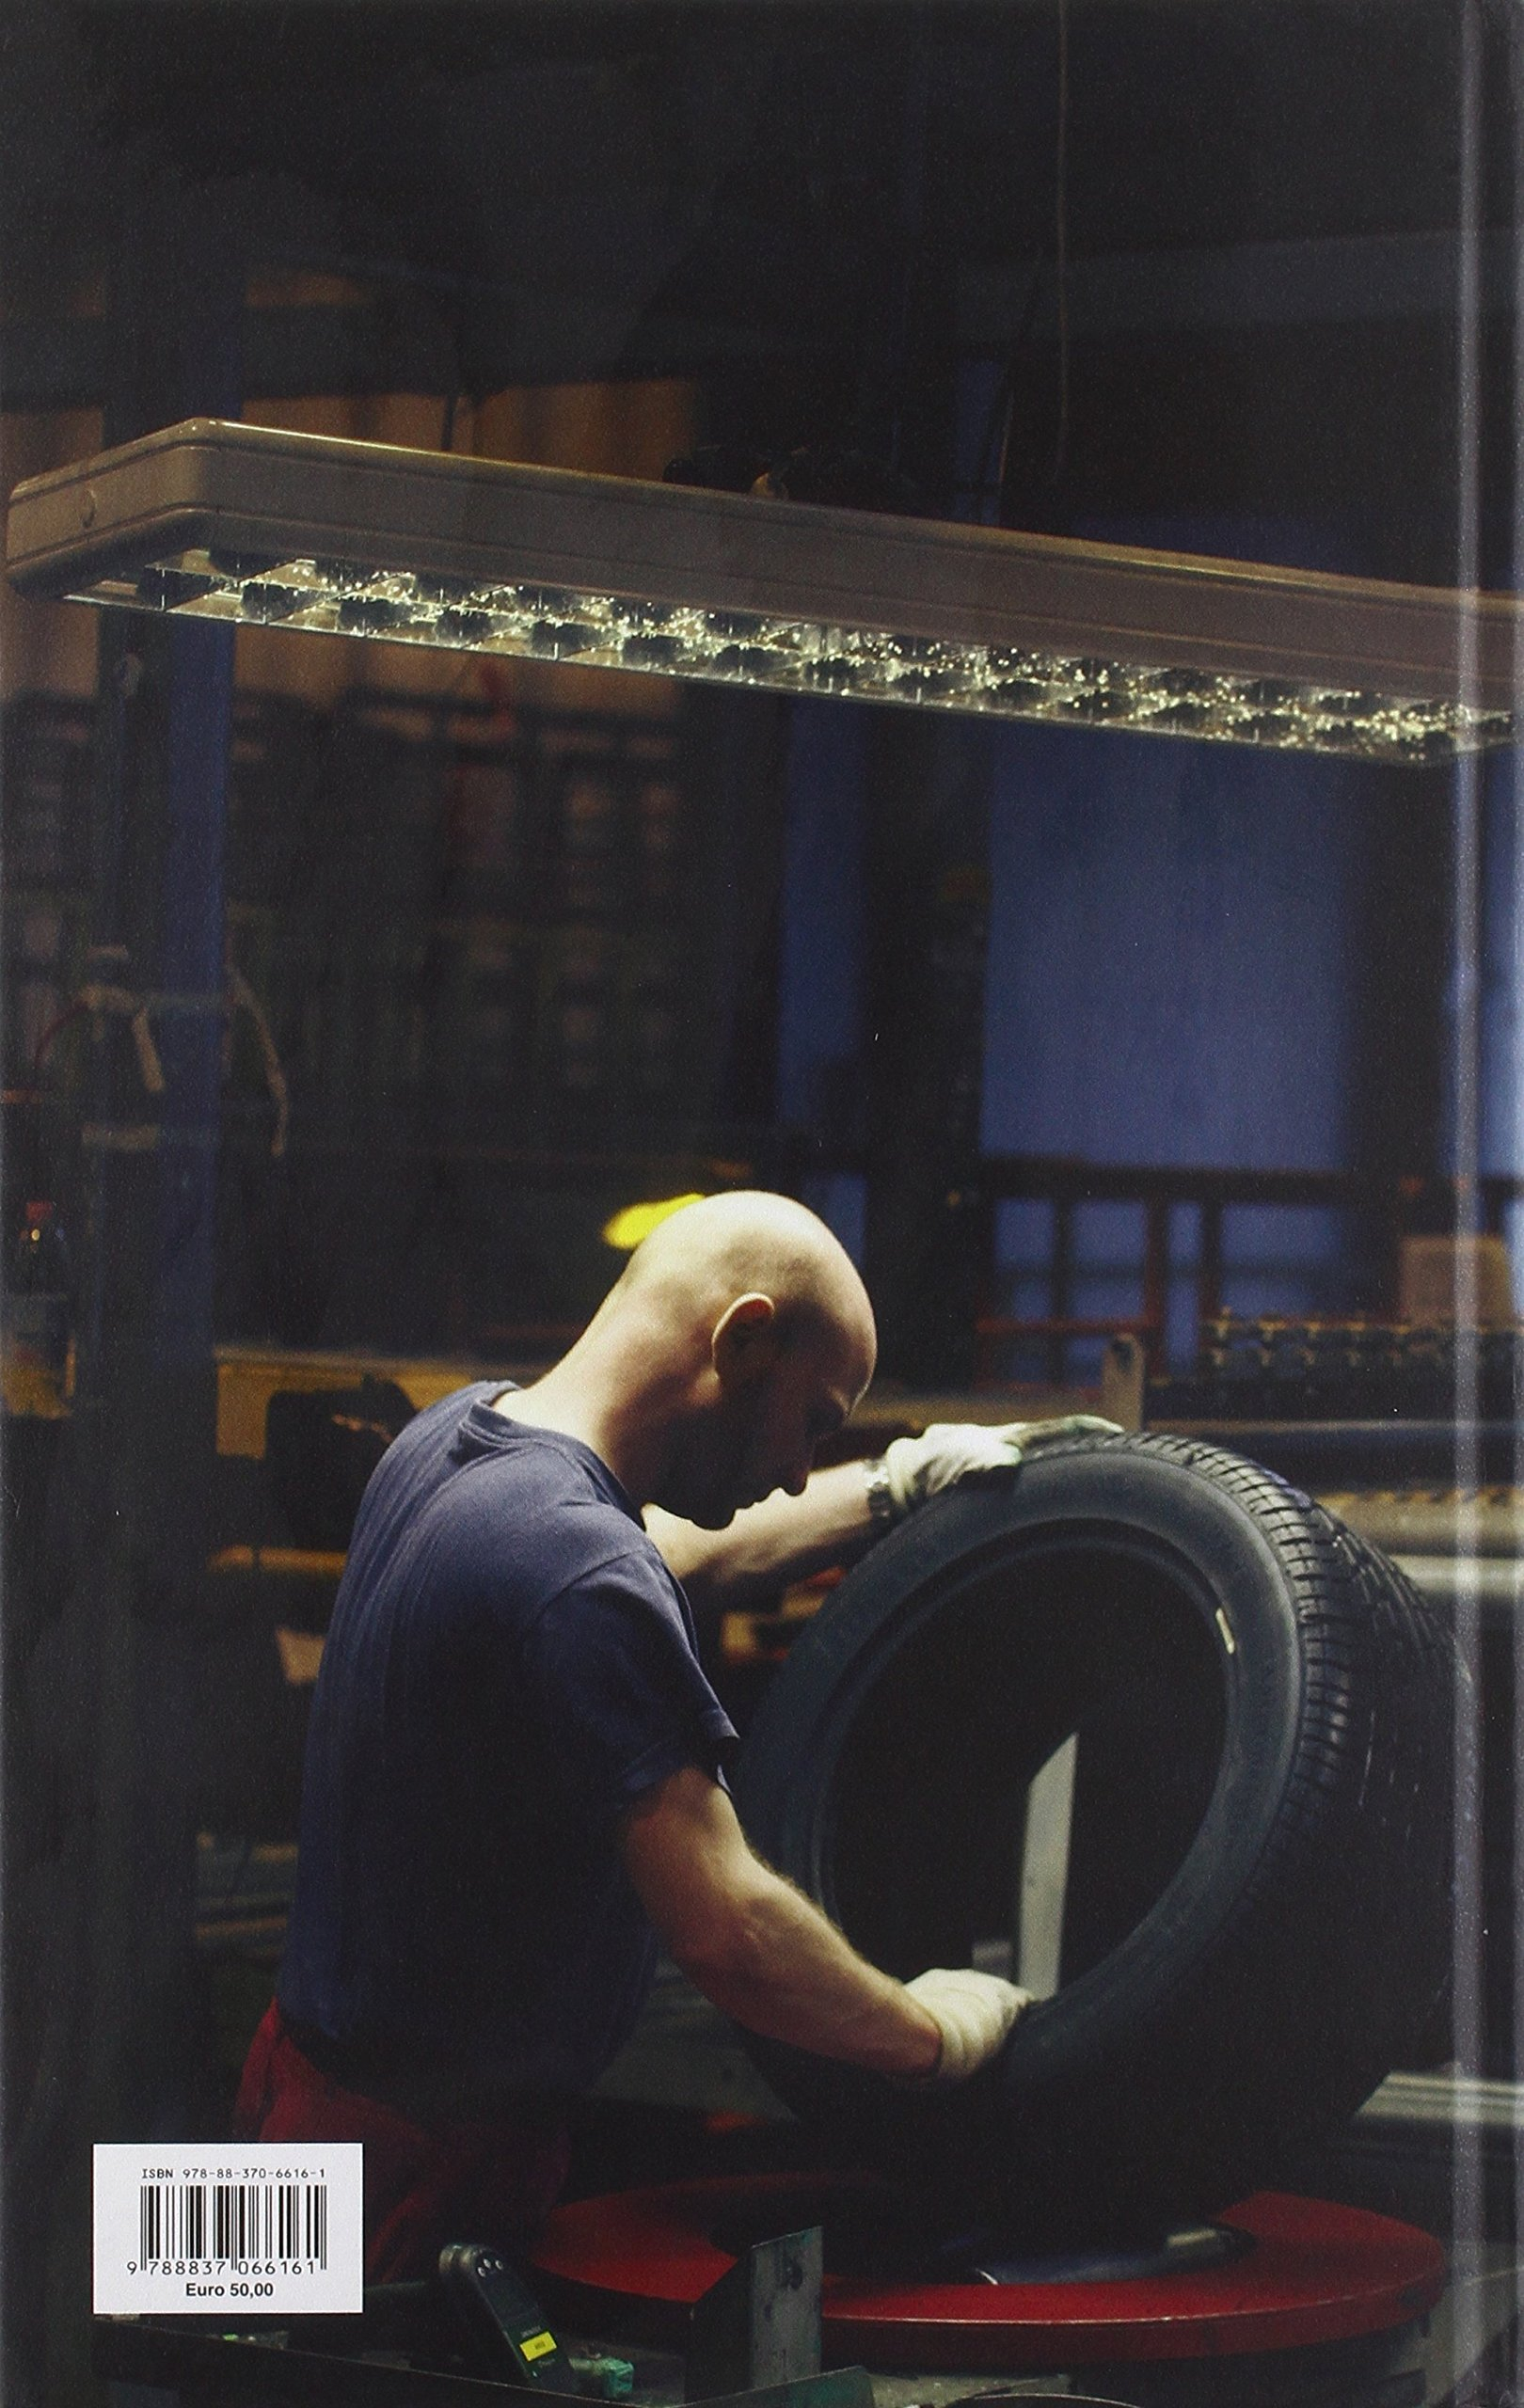 pirelli racconti di lavoro uomini macchine ideepirelli stories of work men machines and ideas ediz bilingue